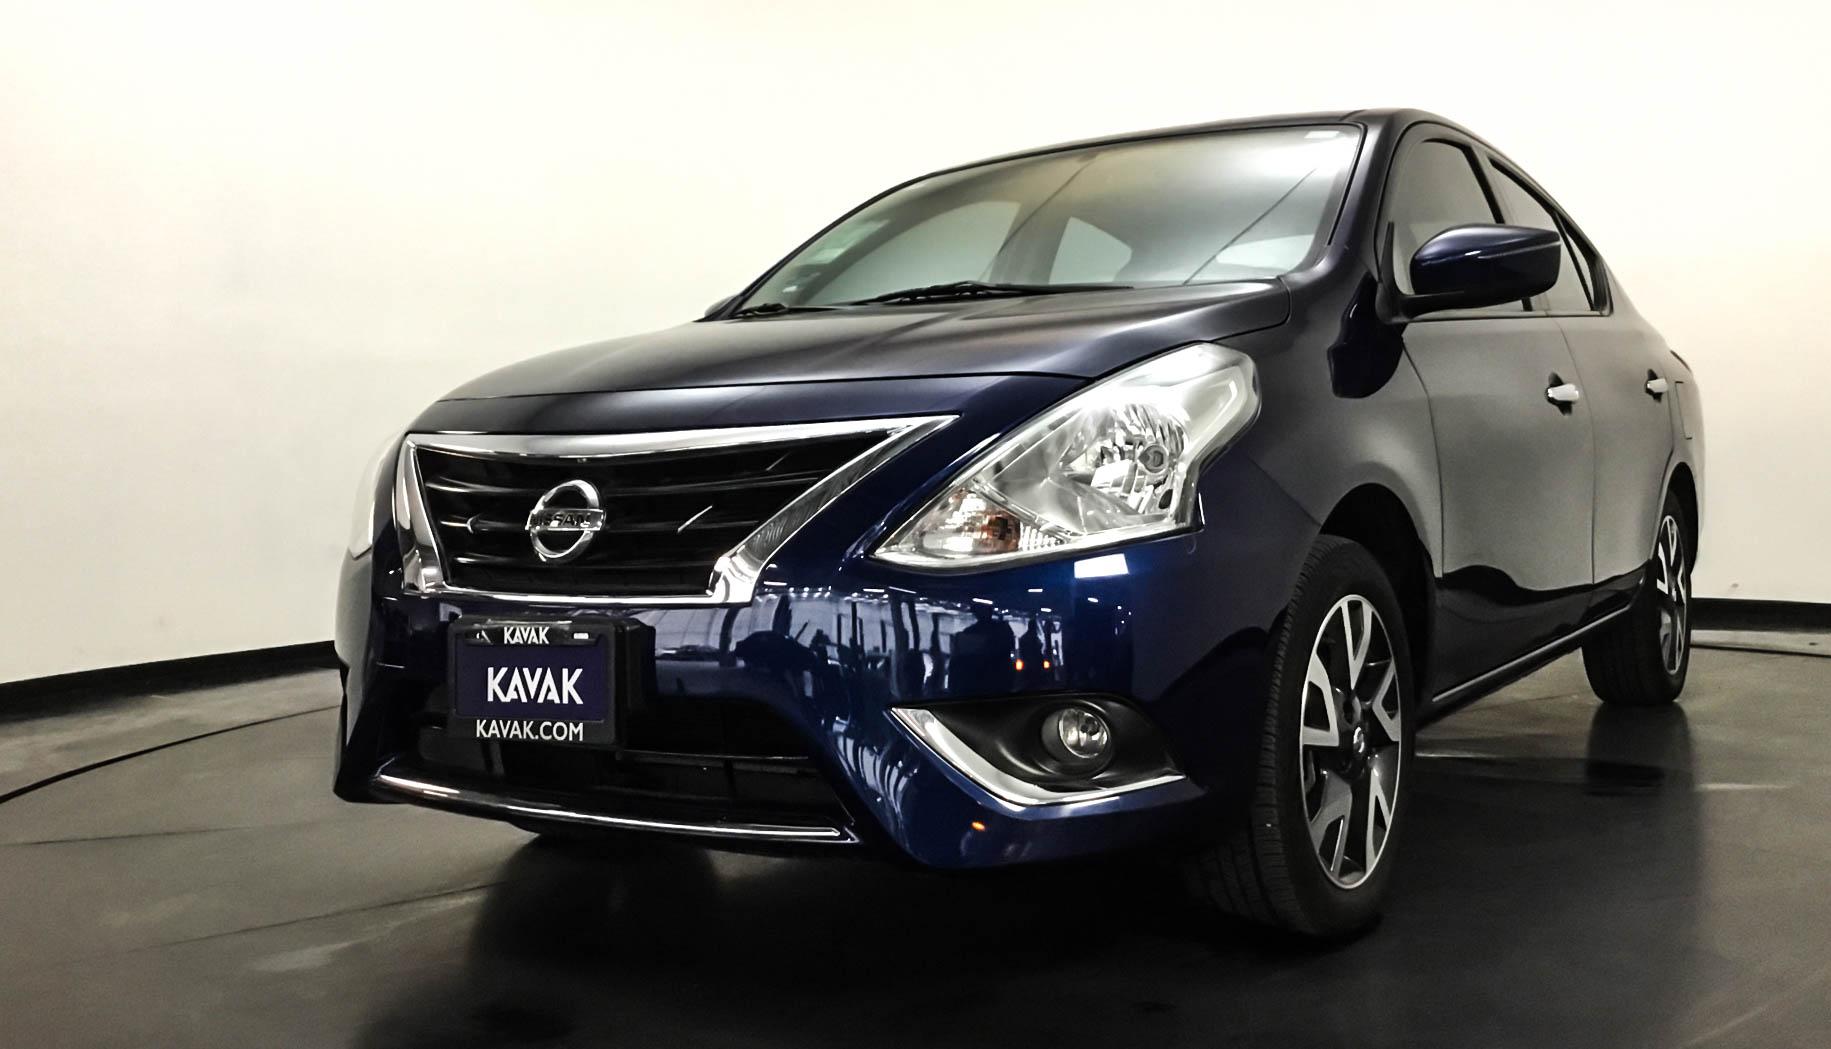 Nissan Versa 2018 13328 18106 Km Precio 212999